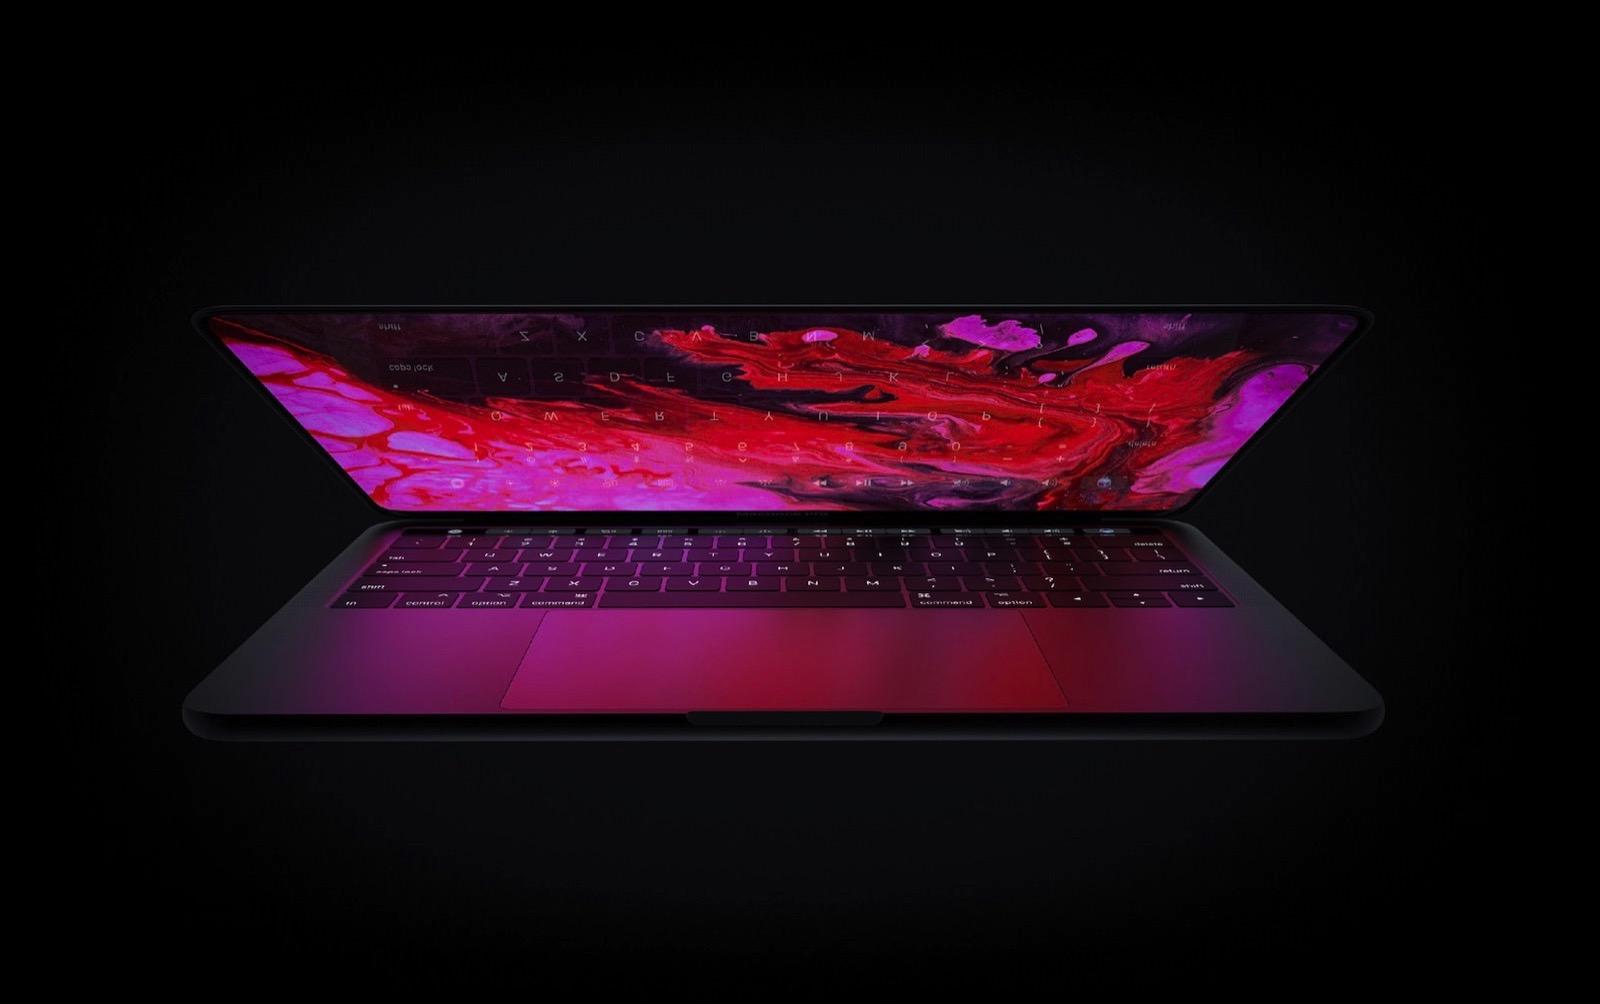 MacBook Pro(2020) concept image